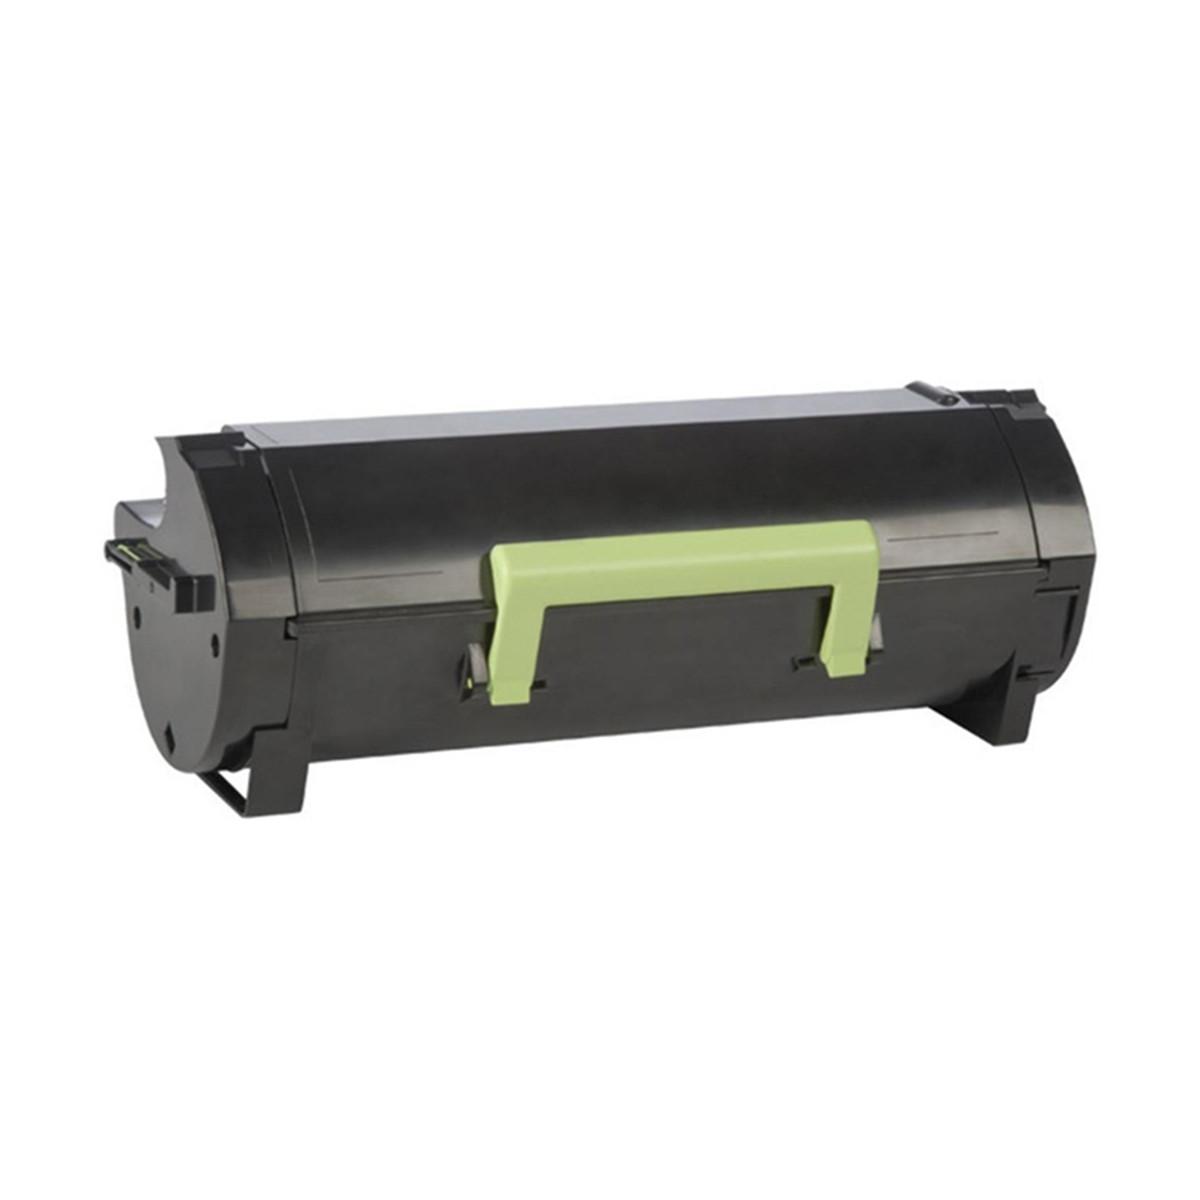 Toner Compatível com Lexmark 50F4X00   MS610 MS410 MS415 MS610DN MS610DE MS415DN   Importado 10k